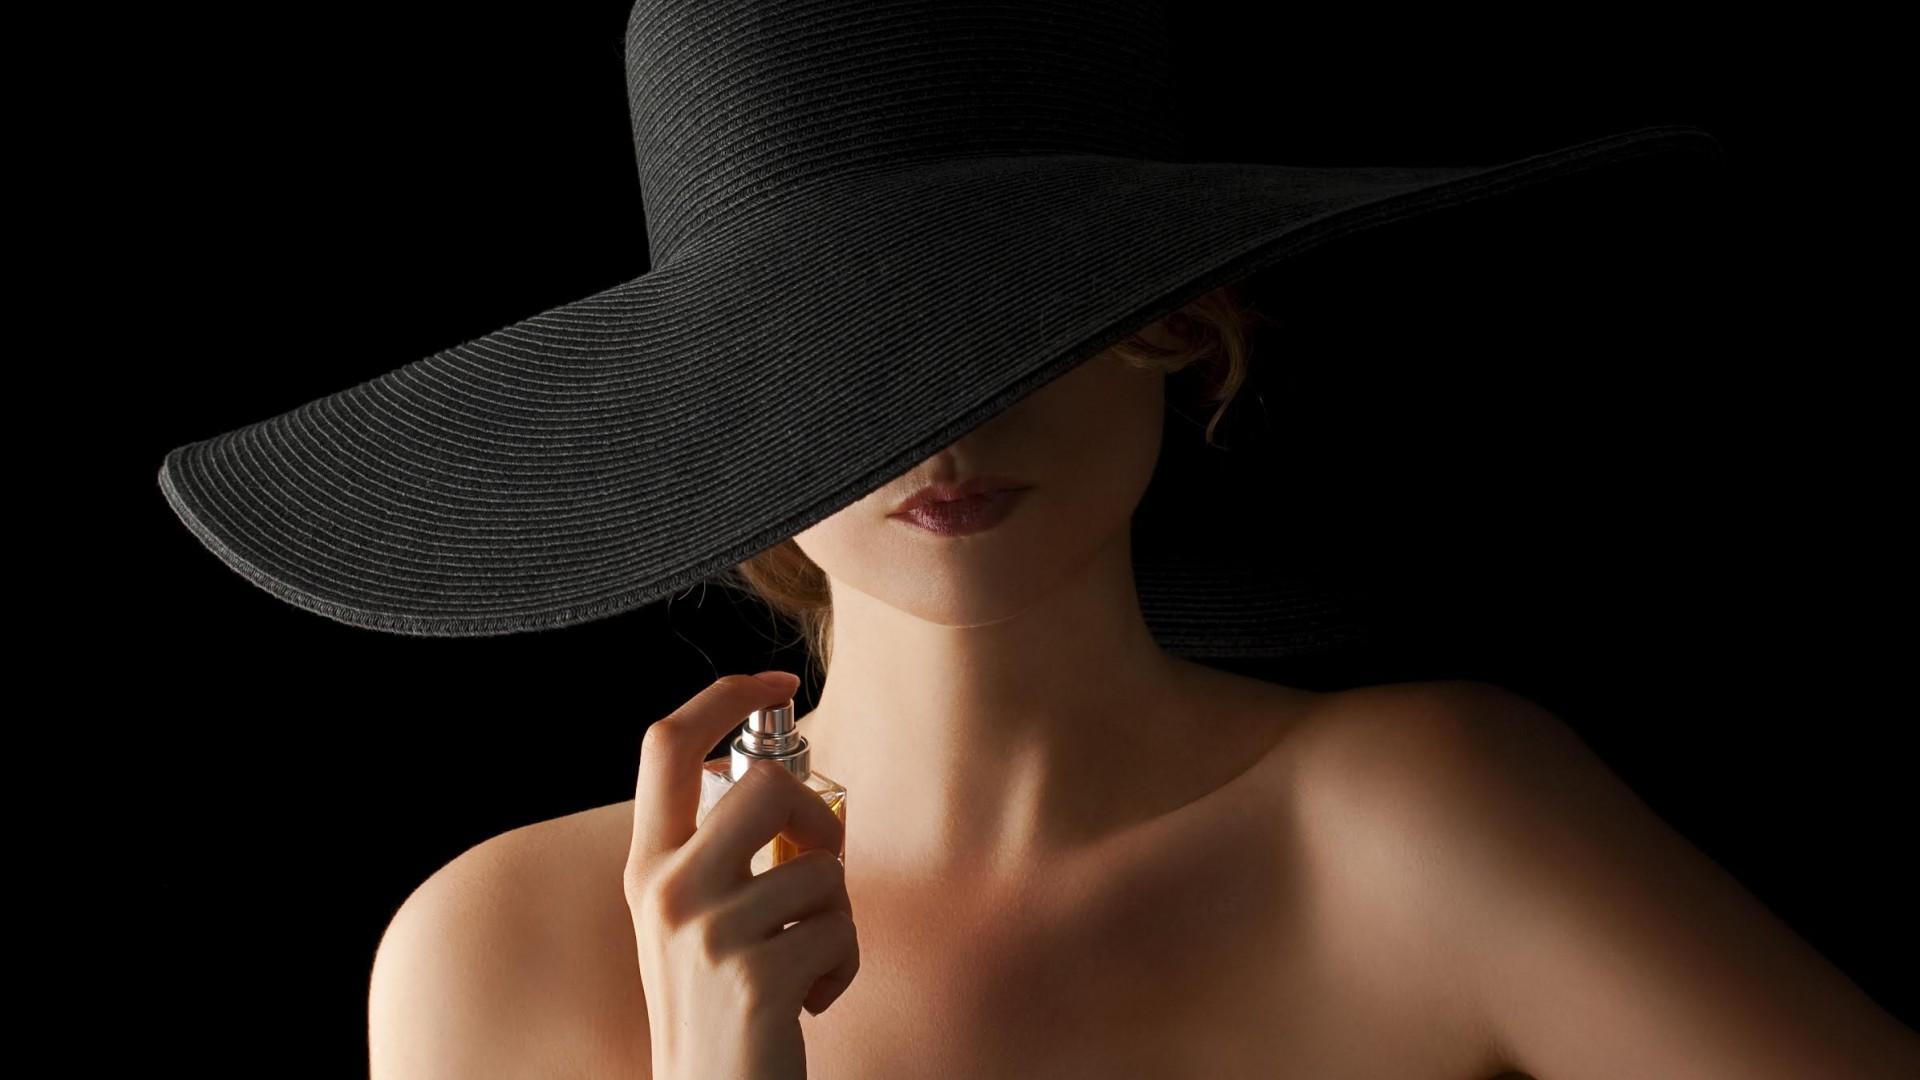 shopping-girl.fr_Parfum-femme-comment-bien-choisir-sans-se-tromper